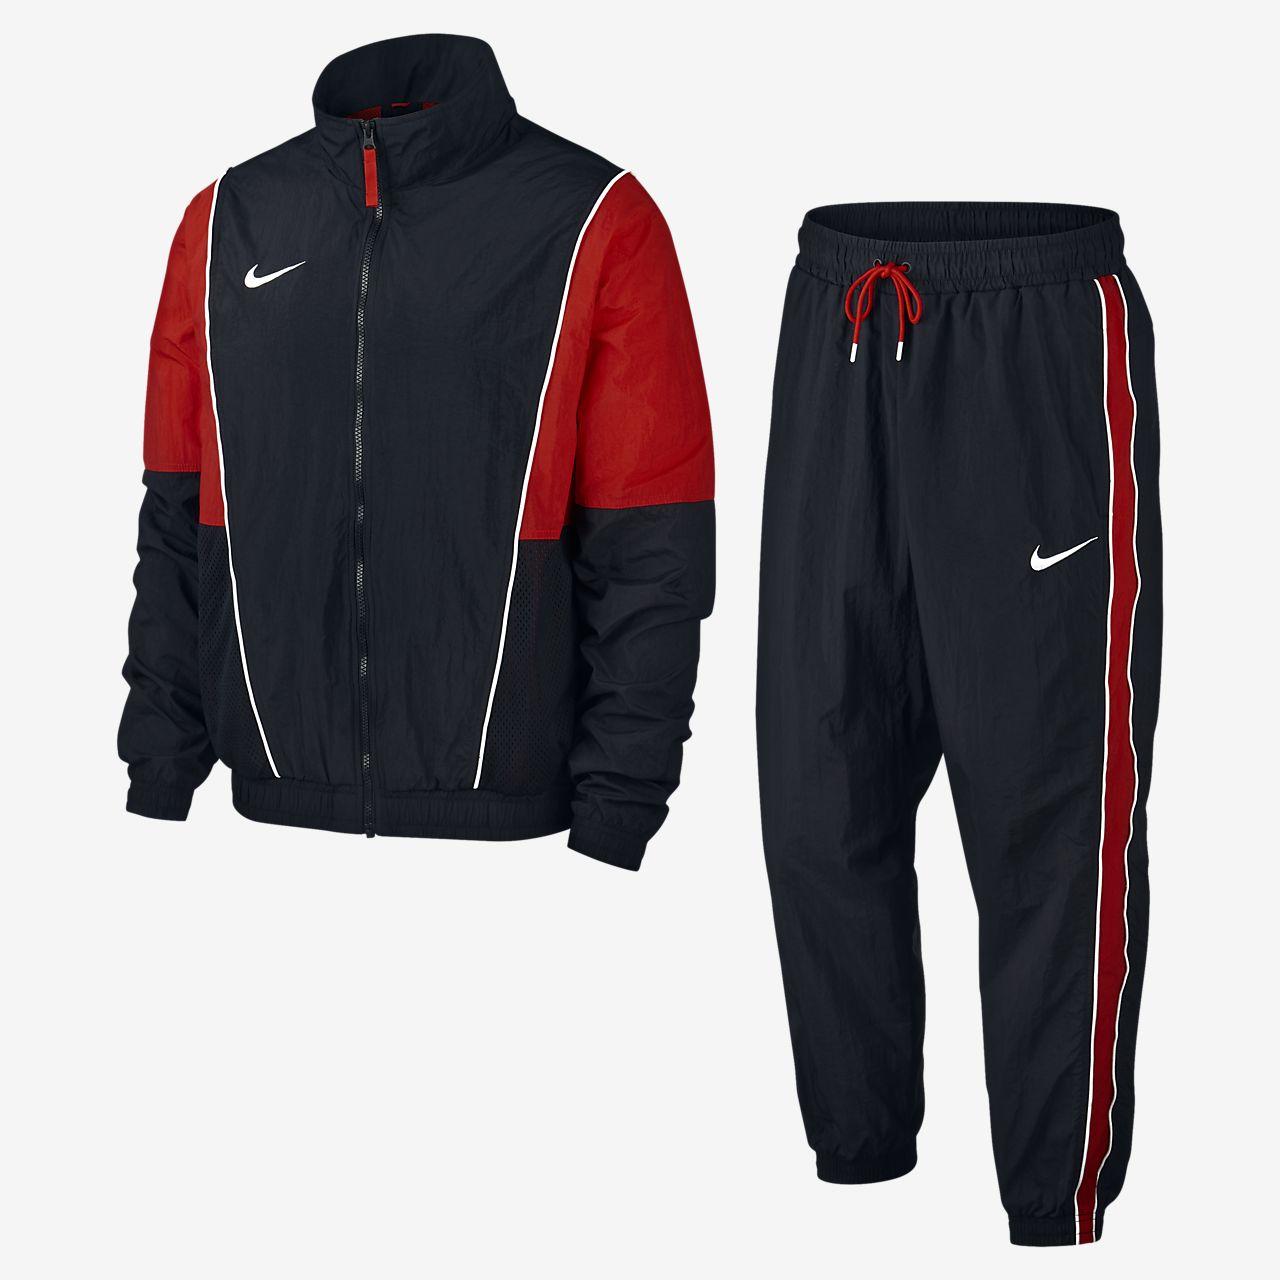 c1e09ae9c71b8e Nike Men s Basketball Tracksuit. Nike.com AU